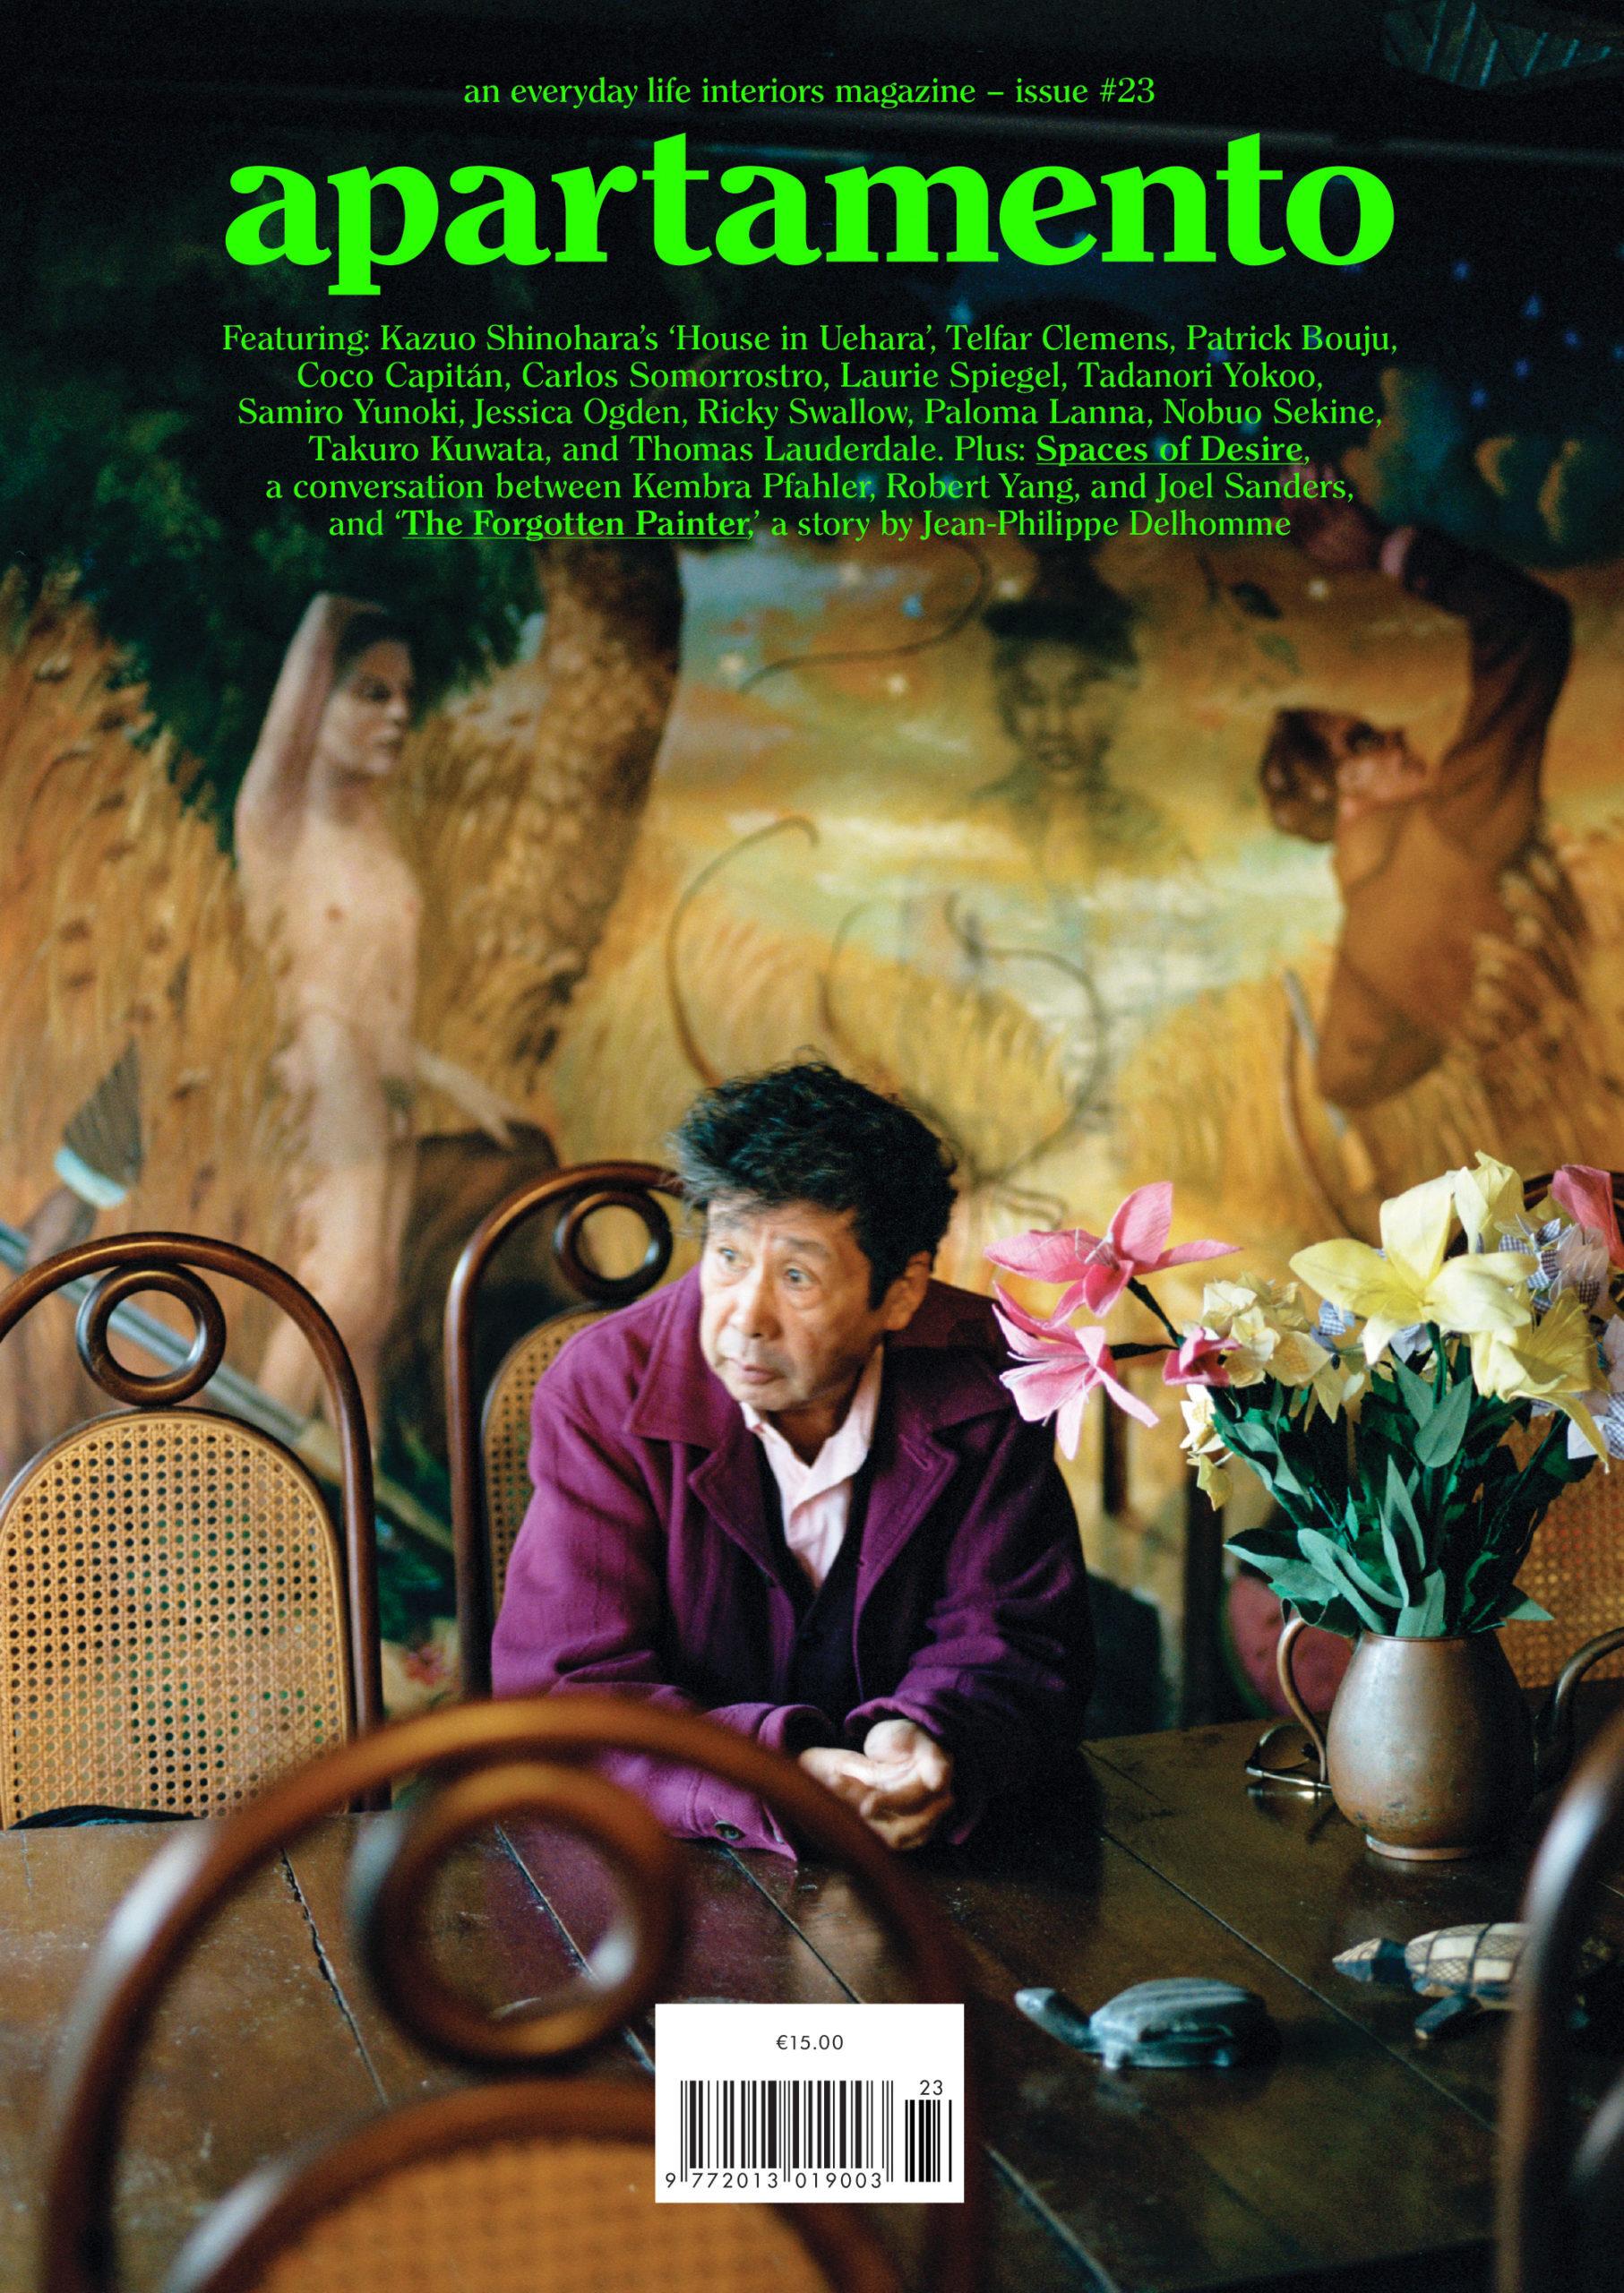 BOOK / apartamento magazine issue #23